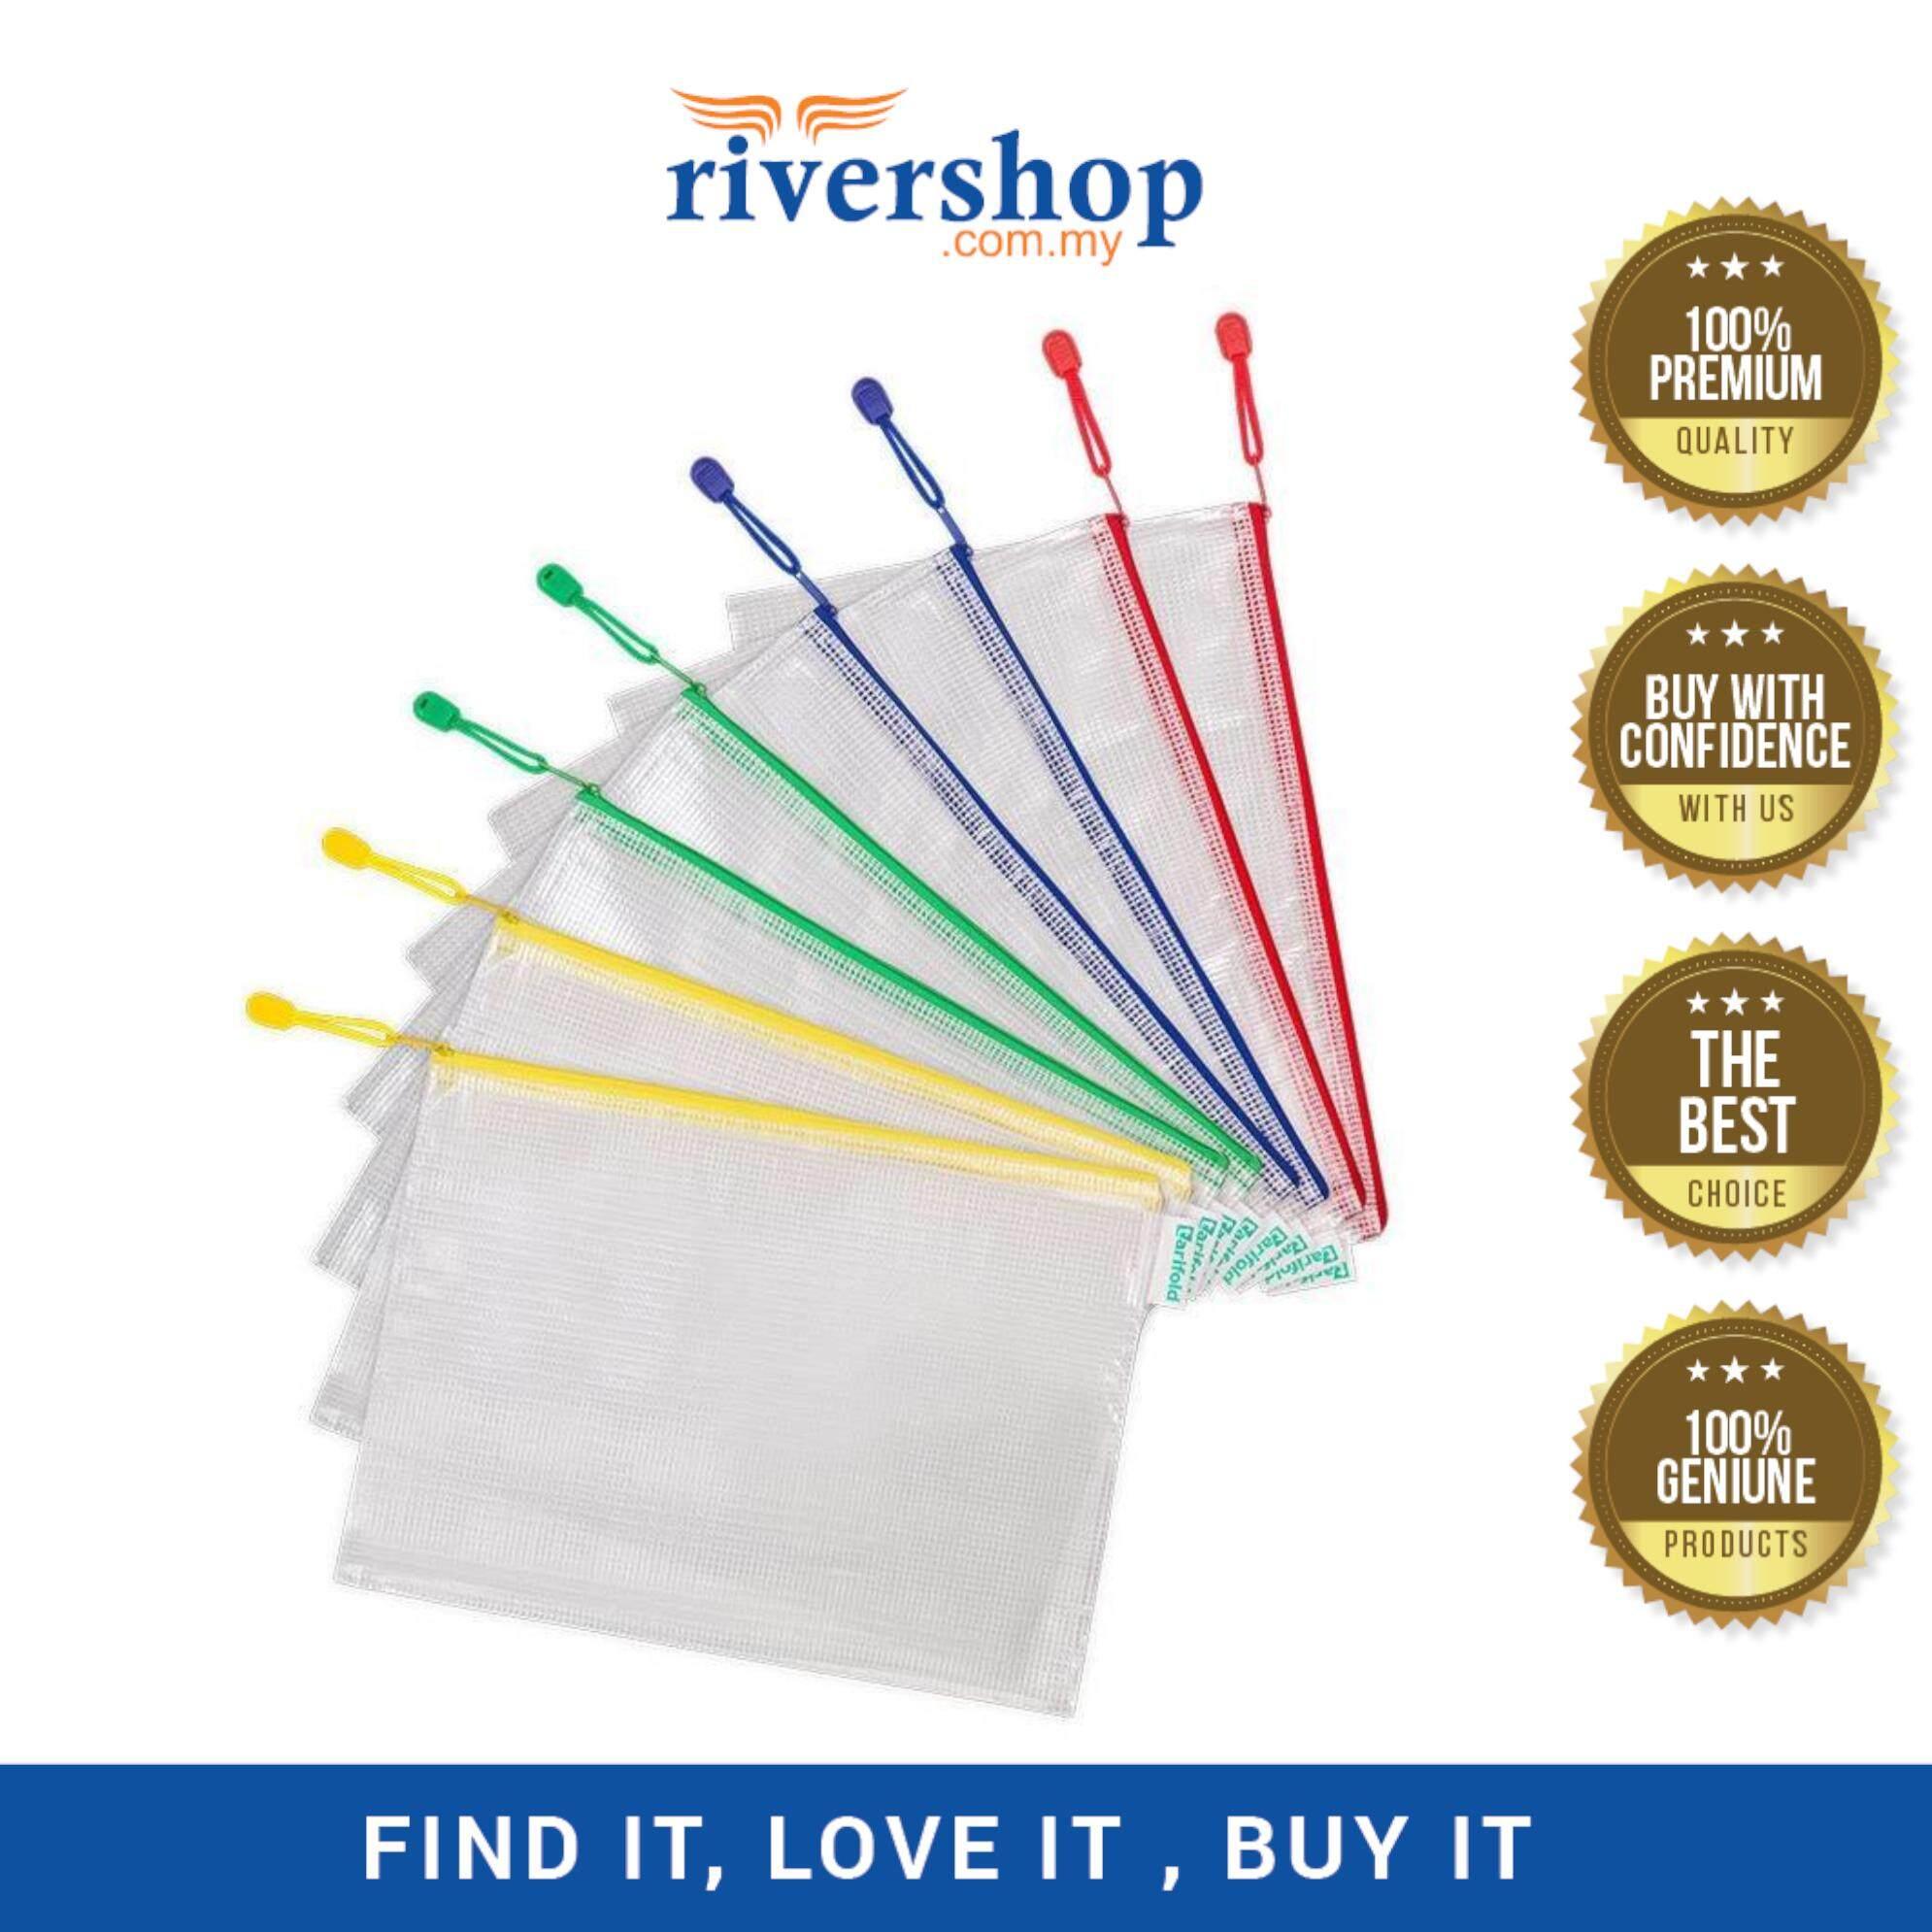 A4 Waterproof Mesh Zipper File Document Bag - 34 x 23.5 x 0cm